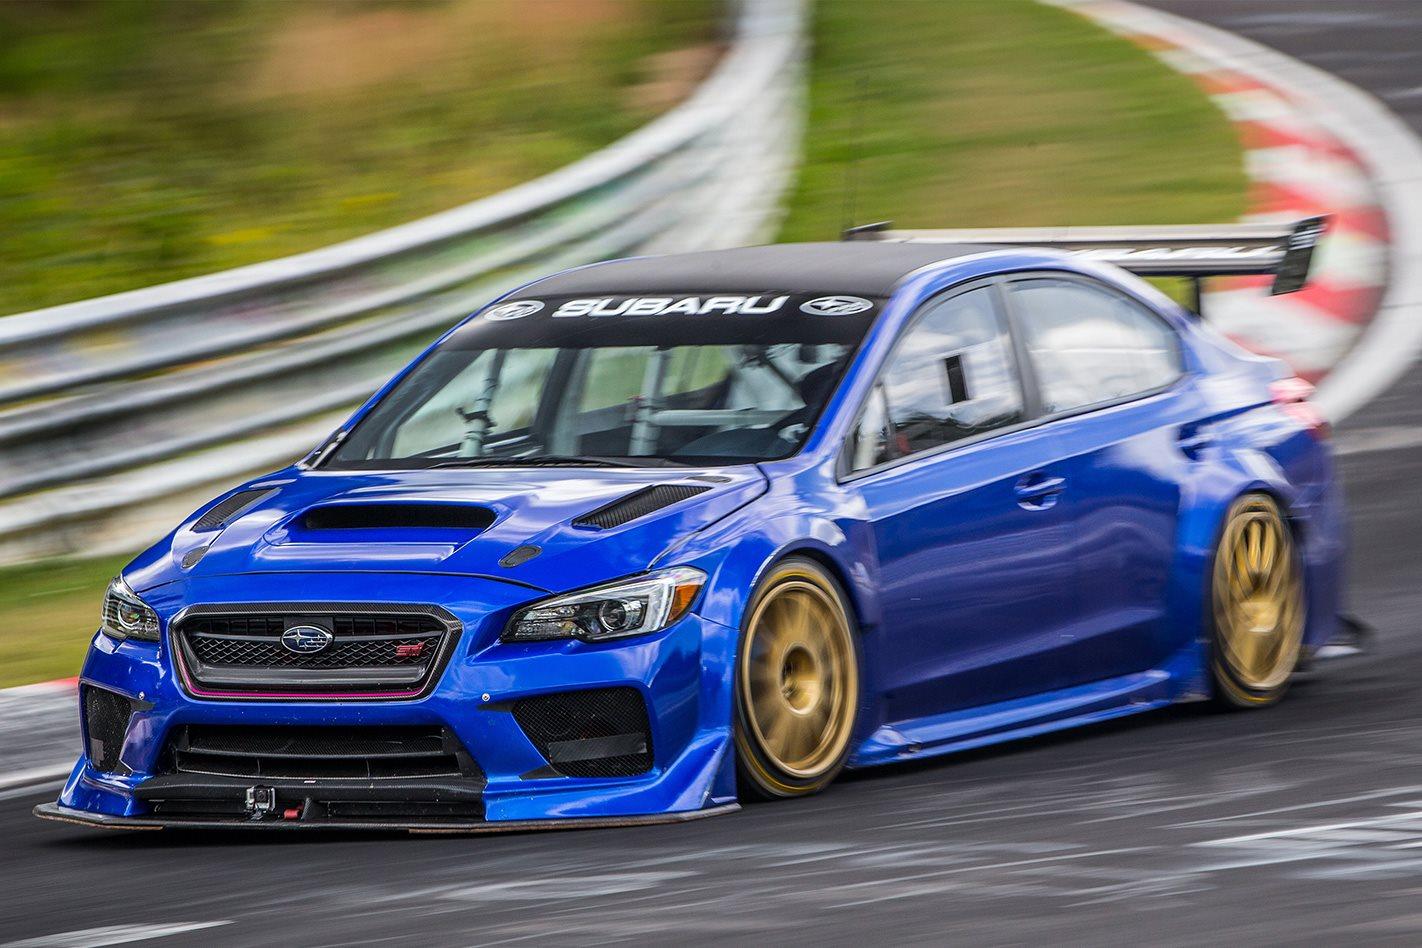 2017 Subaru WRX STi smashes four-door Nurburgring lap record